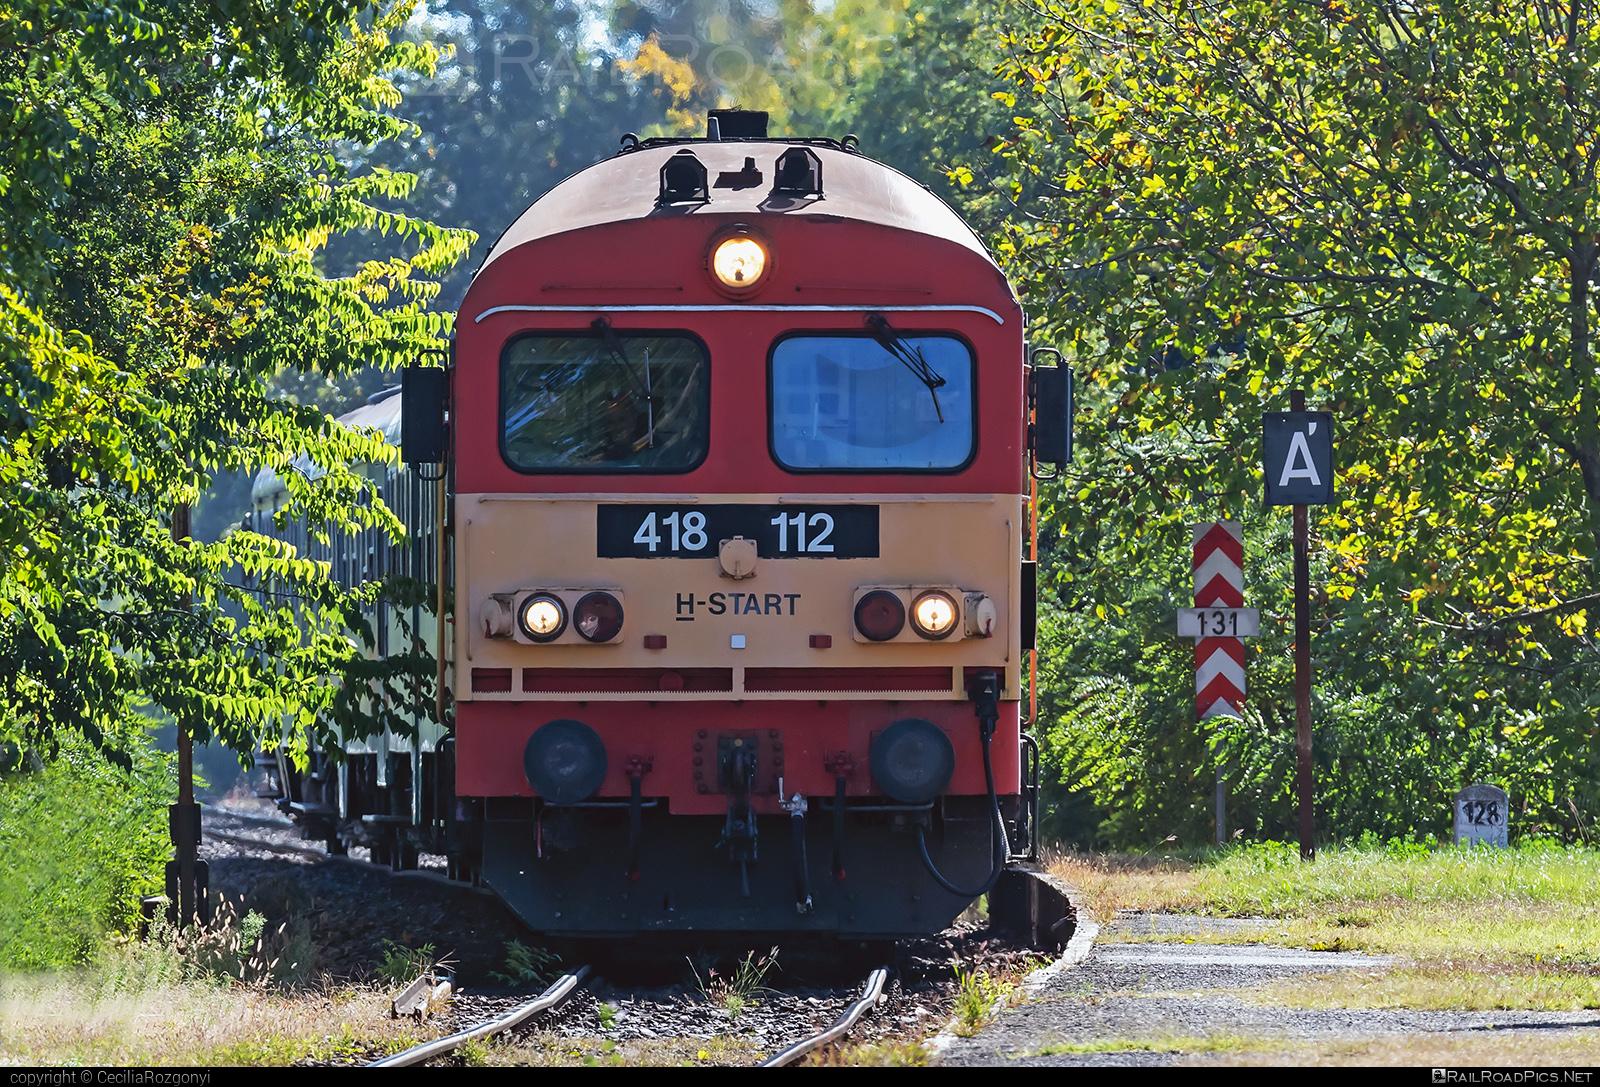 Ganz-MÁVAG DHM7-2 - 418 112 operated by MÁV-START ZRt. #dhm7 #dhm72 #ganz418 #ganzm41 #ganzmavag #ganzmavag418 #ganzmavagdhm7 #ganzmavagdhm72 #ganzmavagm41 #m41locomotive #mavstart #mavstartzrt